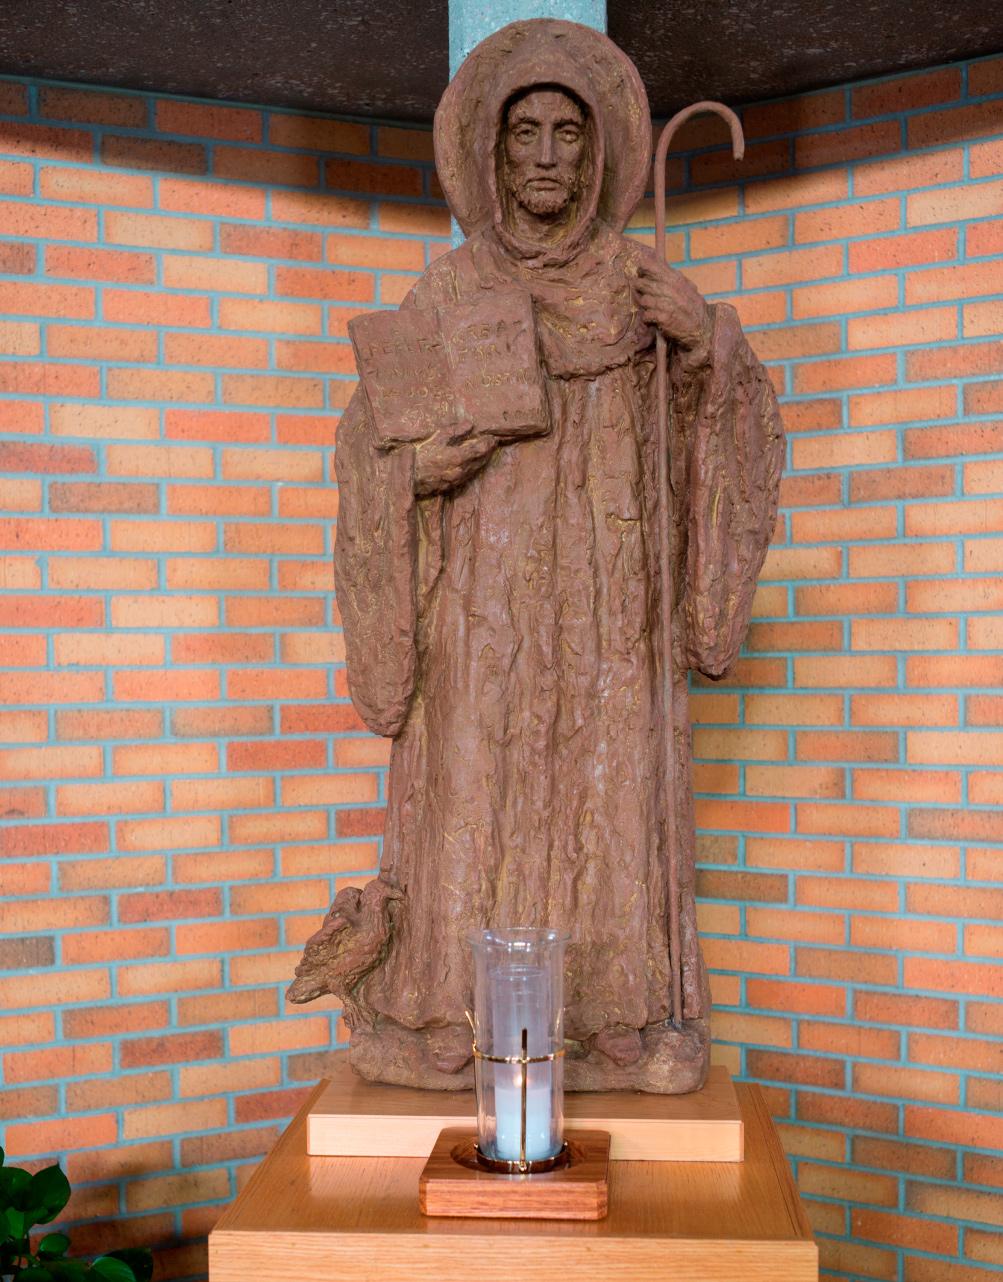 St. Benedict Statue in the Chapel